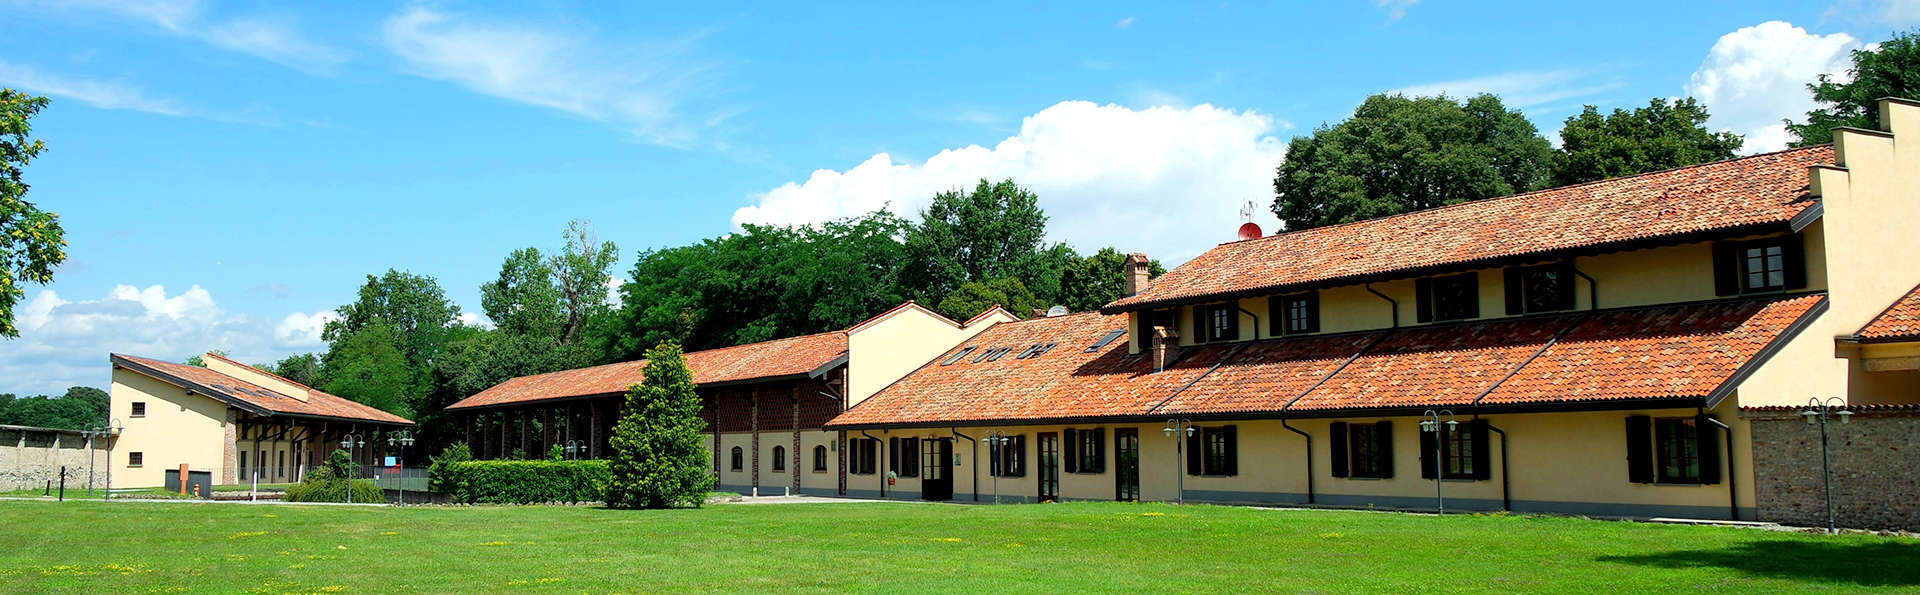 Country Hotel Villa Castelbarco - Edit_Front5.jpg